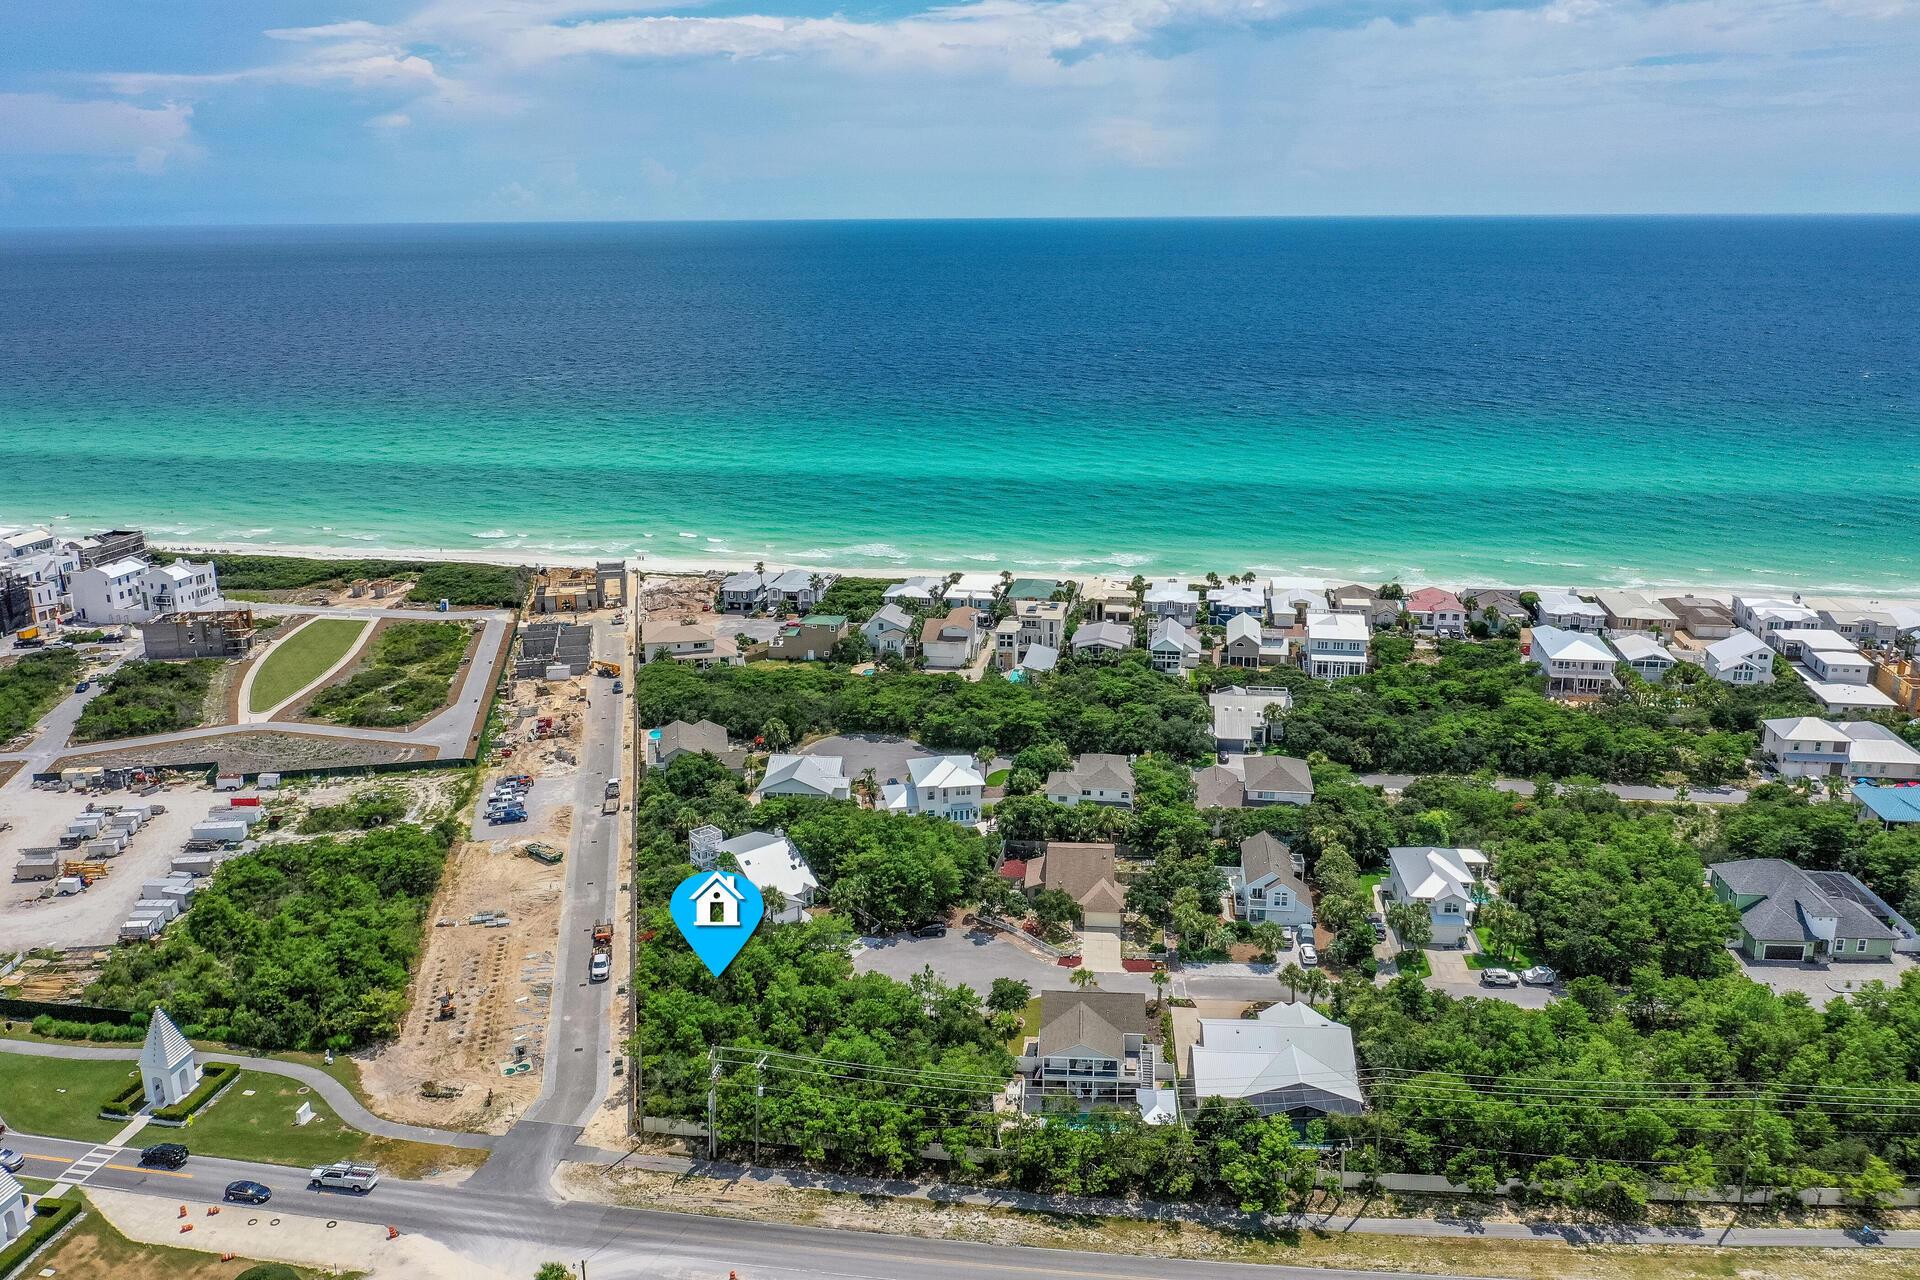 14 Walton Bonita Dr Panama City Beach FL